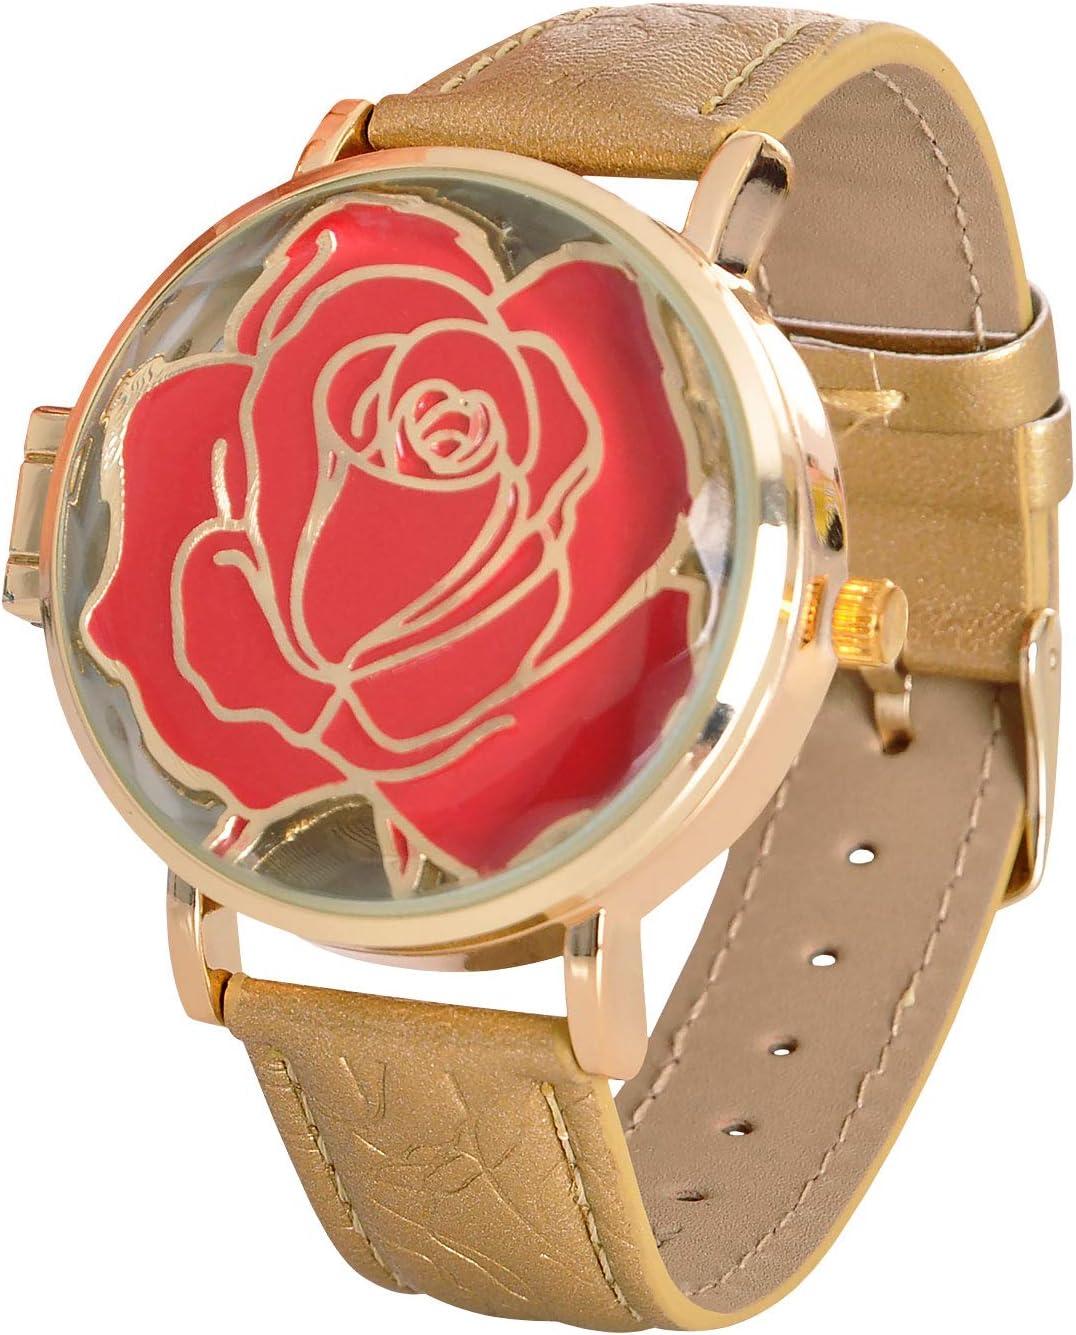 Die Schöne und das Biest La Bella y la Bestia Disney Watch Enchanted Rose analógico con bisagras